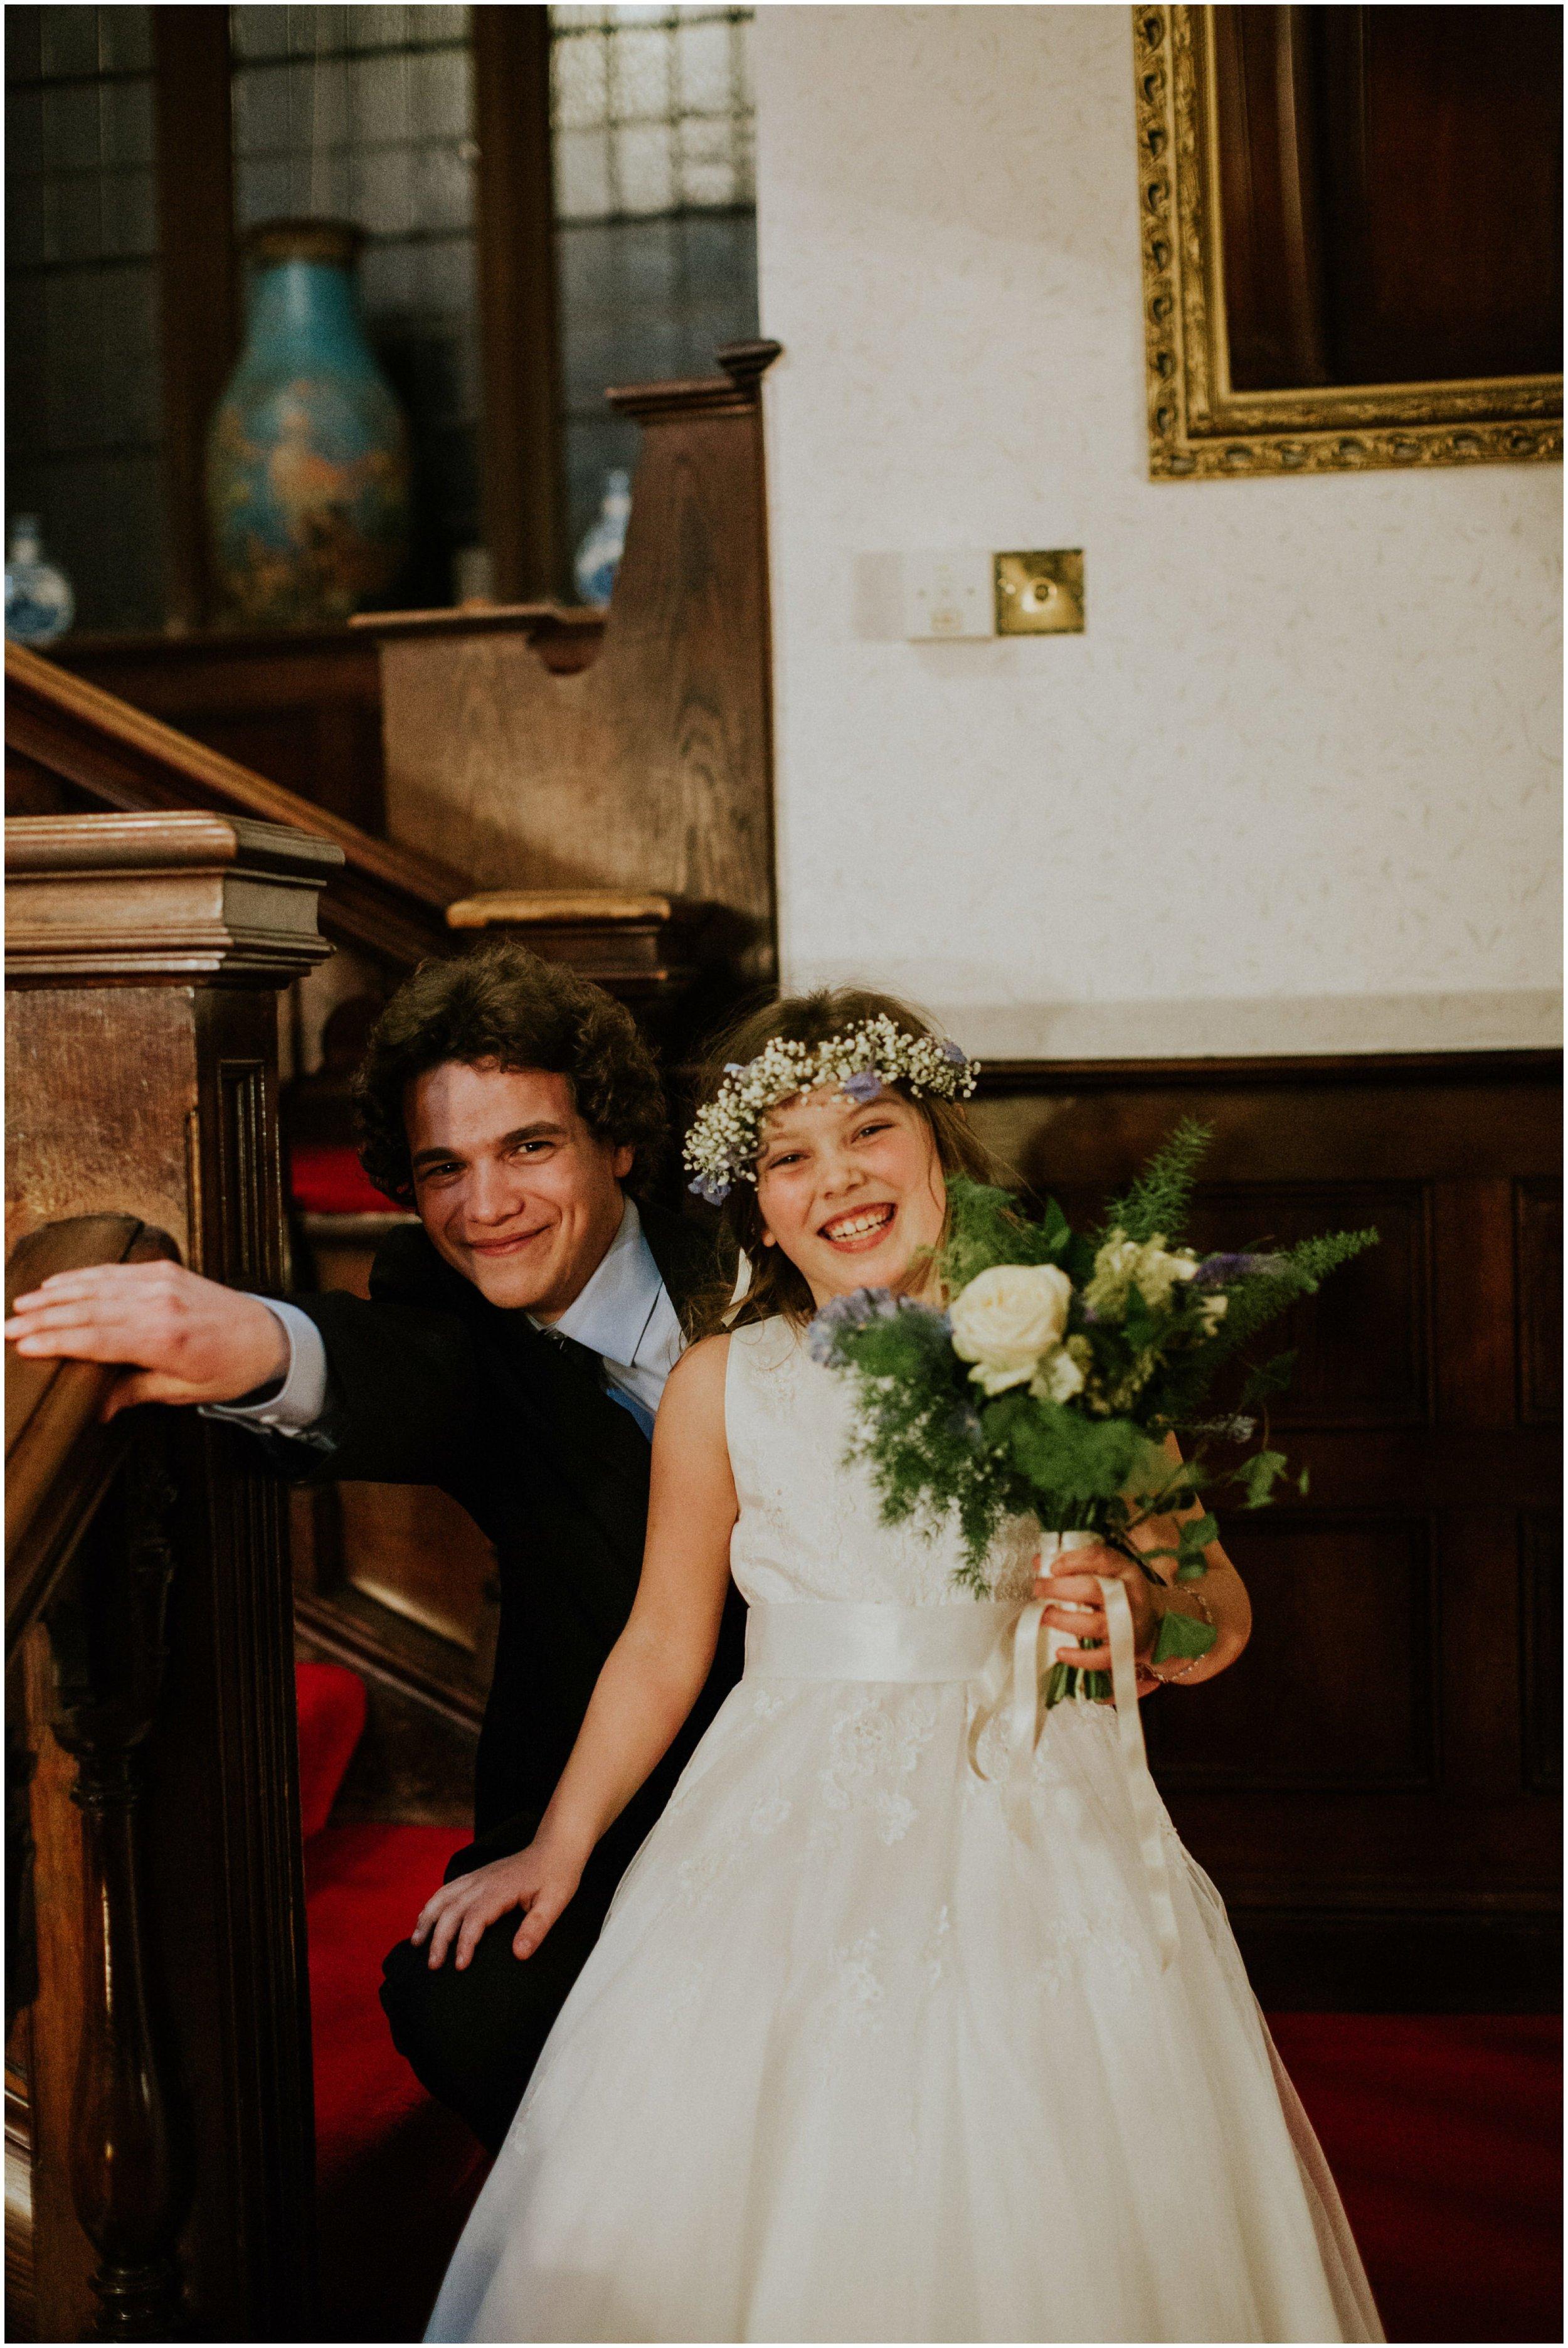 Photography 78 - Glasgow Wedding Photographer - Dave & Alana_0093.jpg